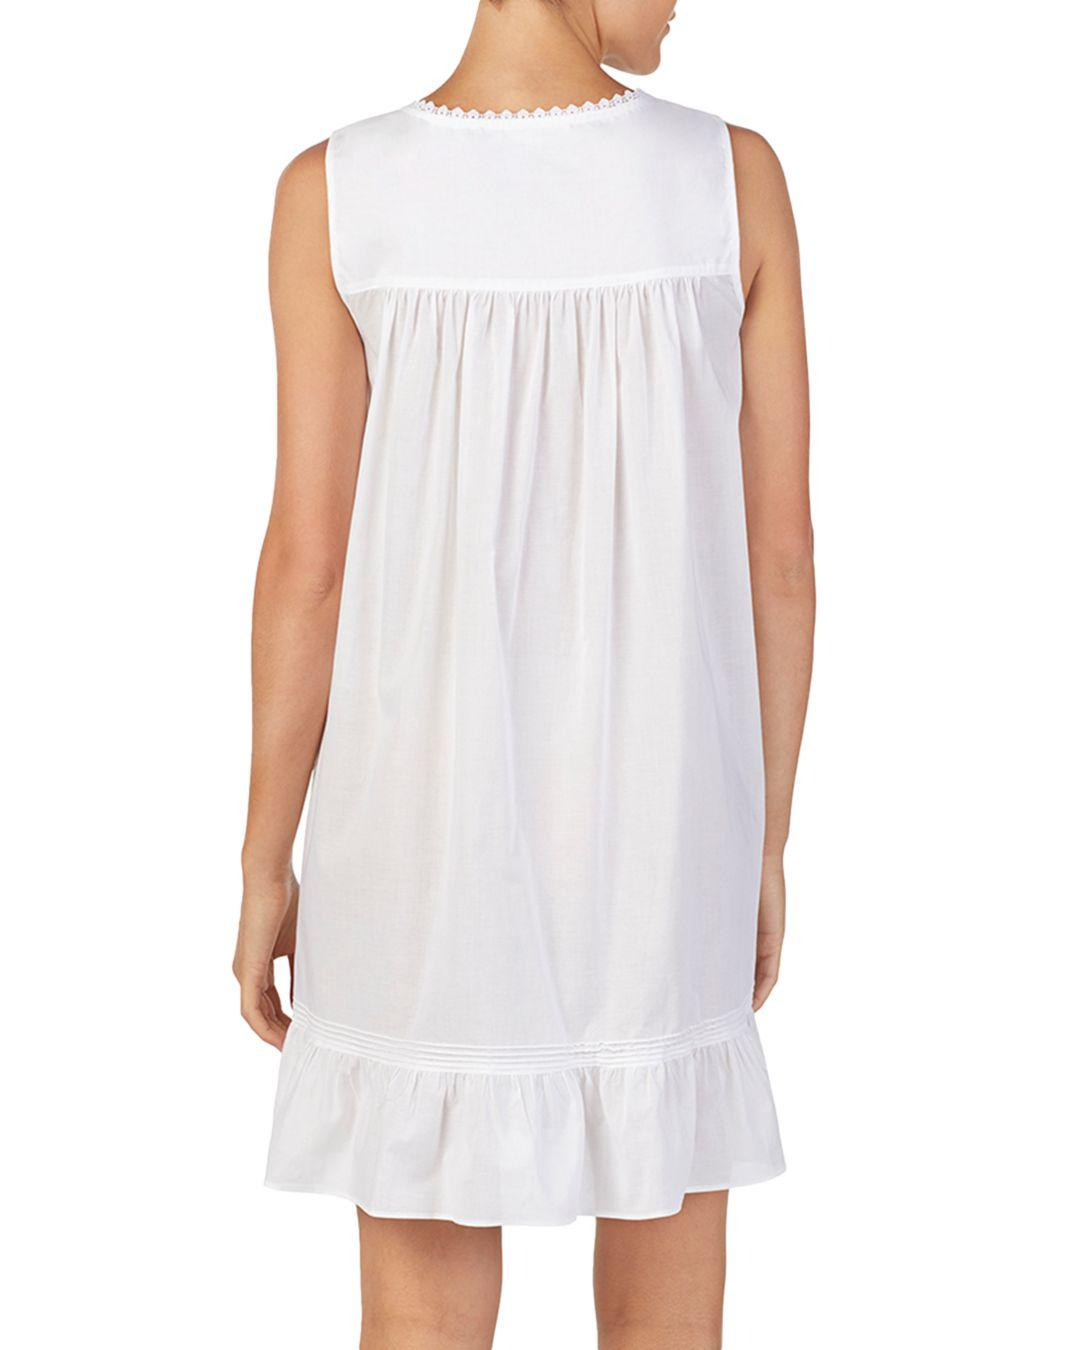 946085e662 Lyst - Eileen West Sleeveless Short Cotton Ballet Nightgown in White